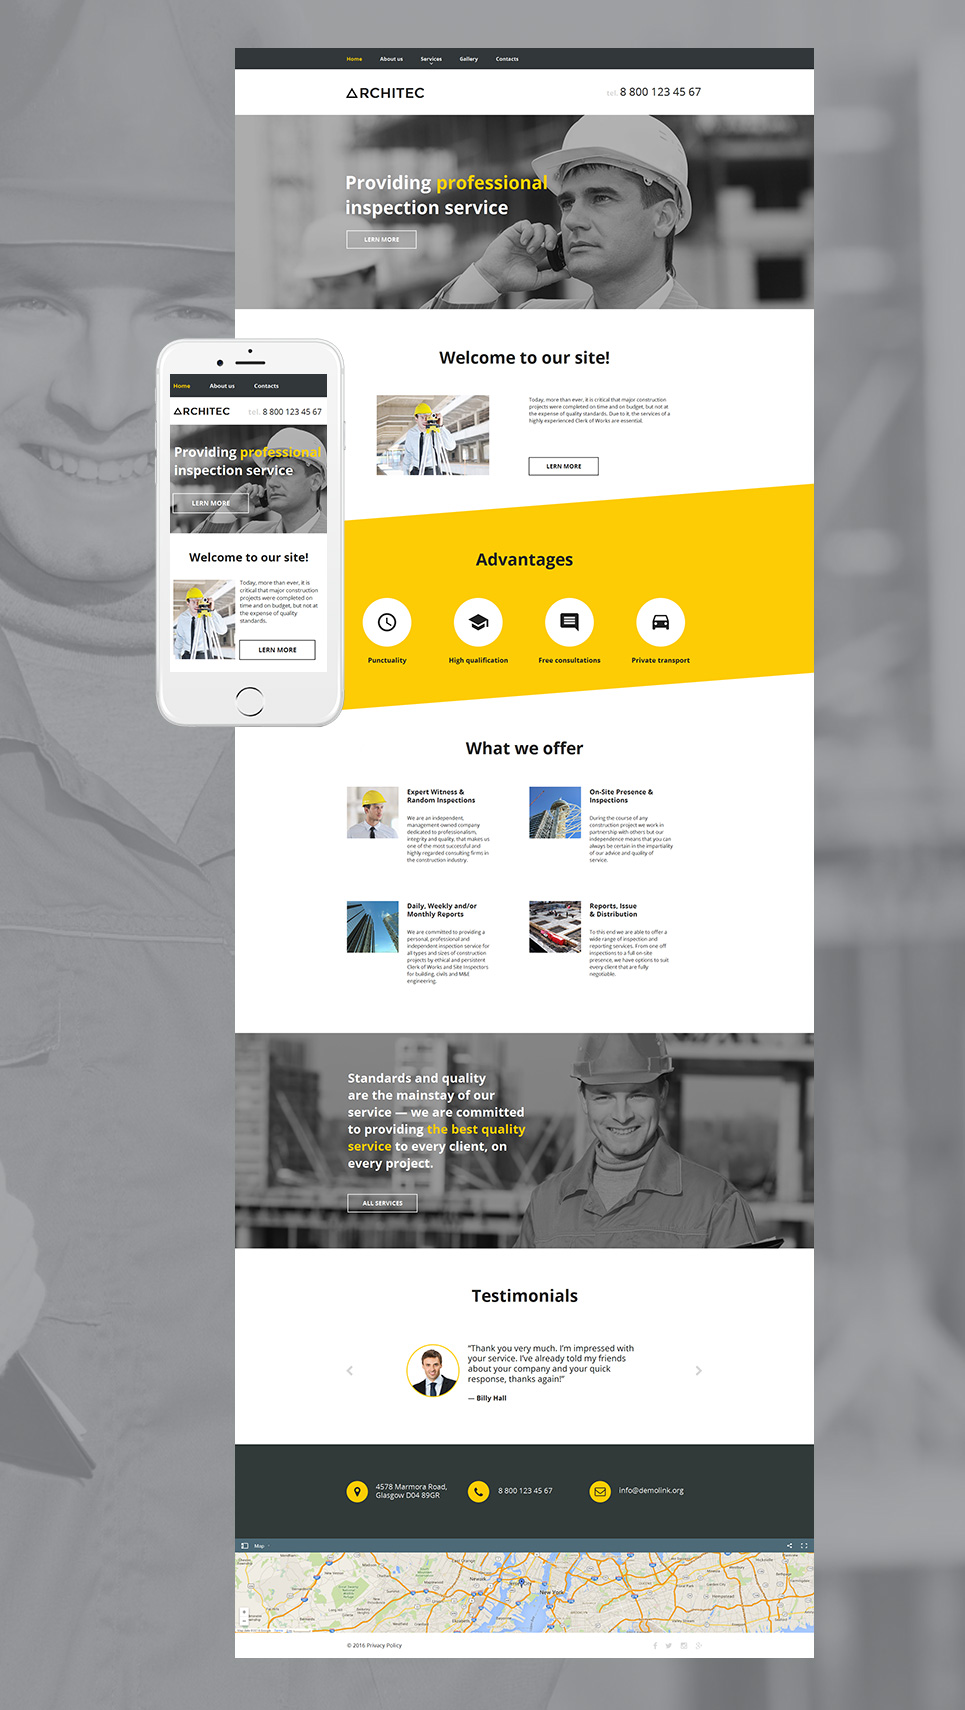 MotoCMS HTML Шаблон #58744 из категории Архитектура - image